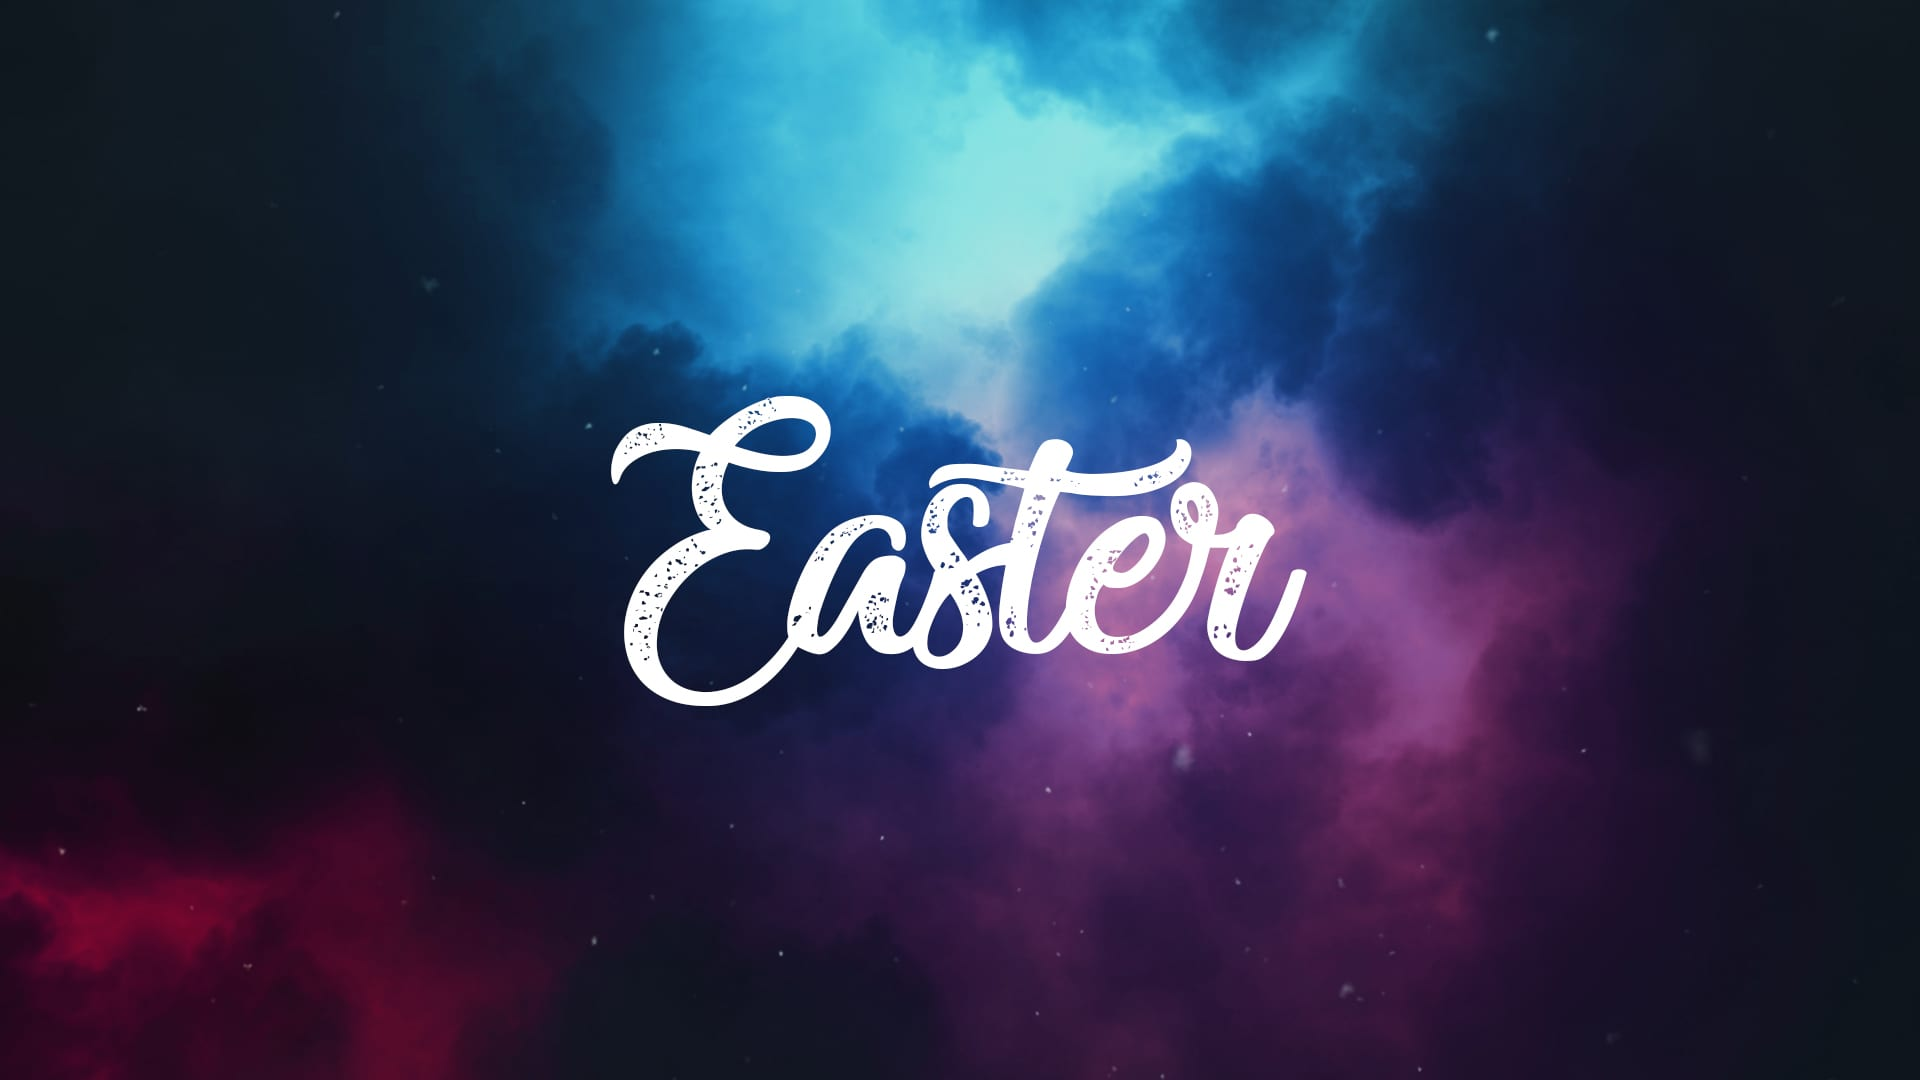 Easter 2018